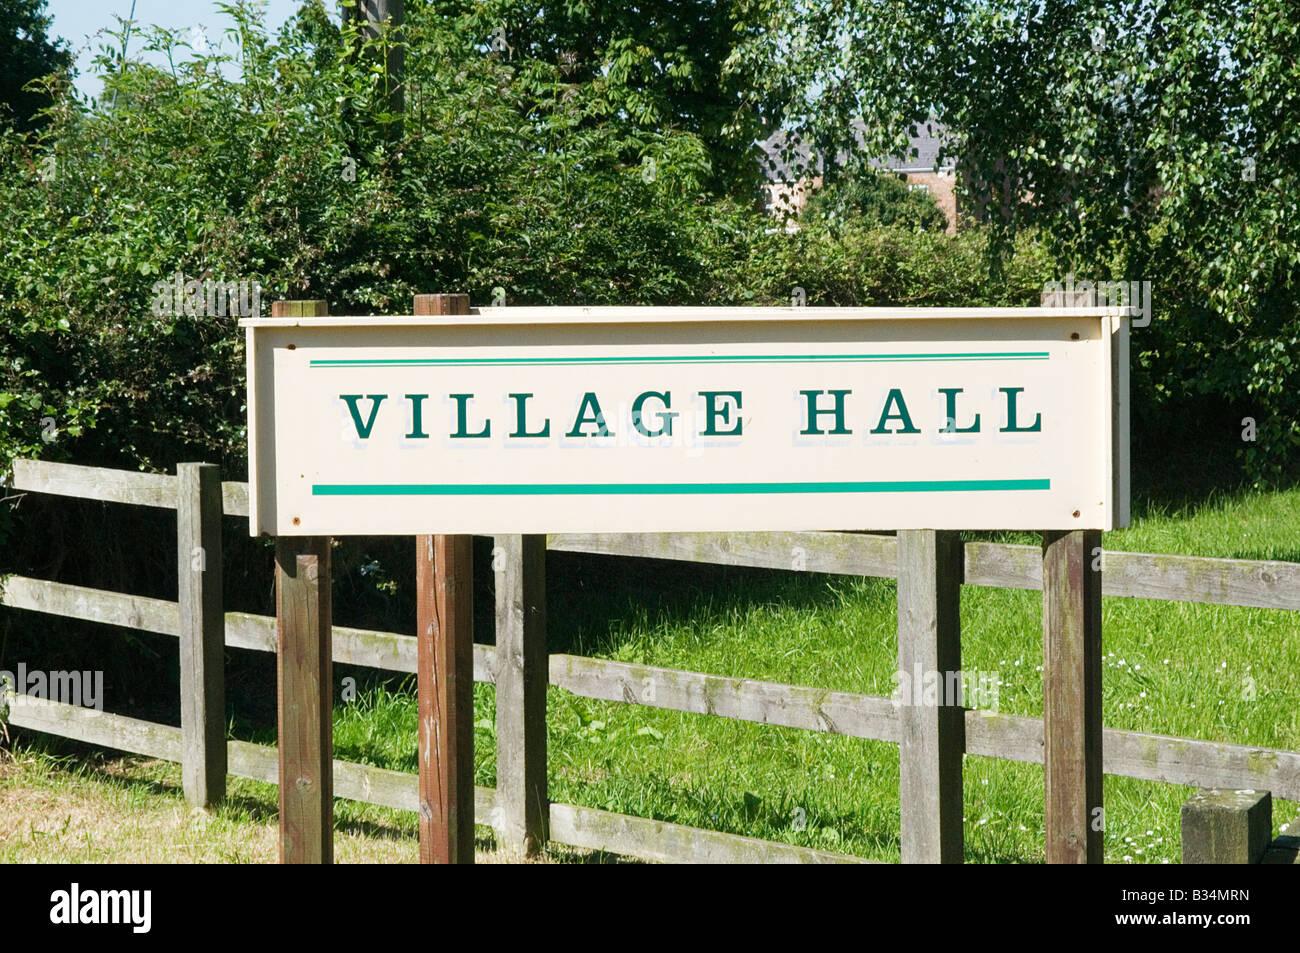 village hall english meeting place village life - Stock Image